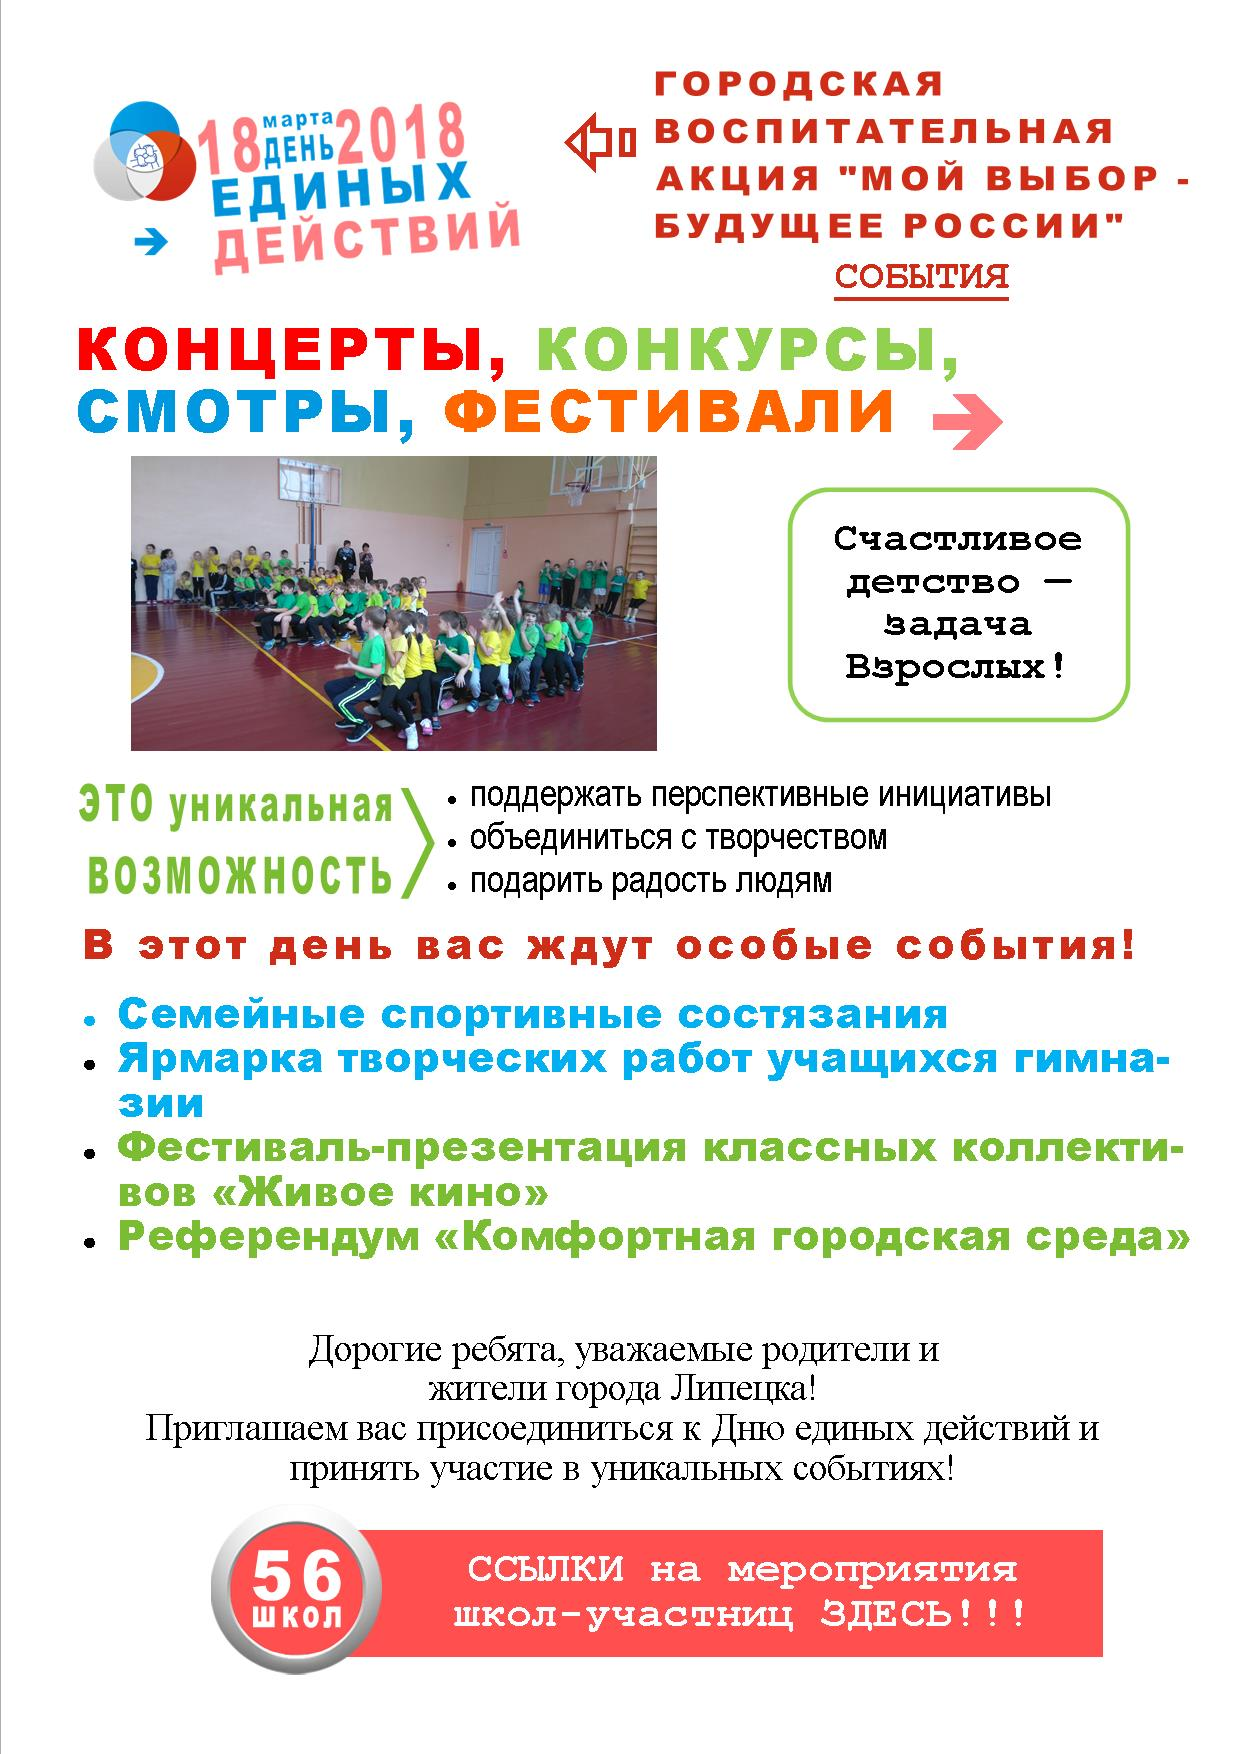 http://gimnasium12.ucoz.ru/image/18032018_1.jpg